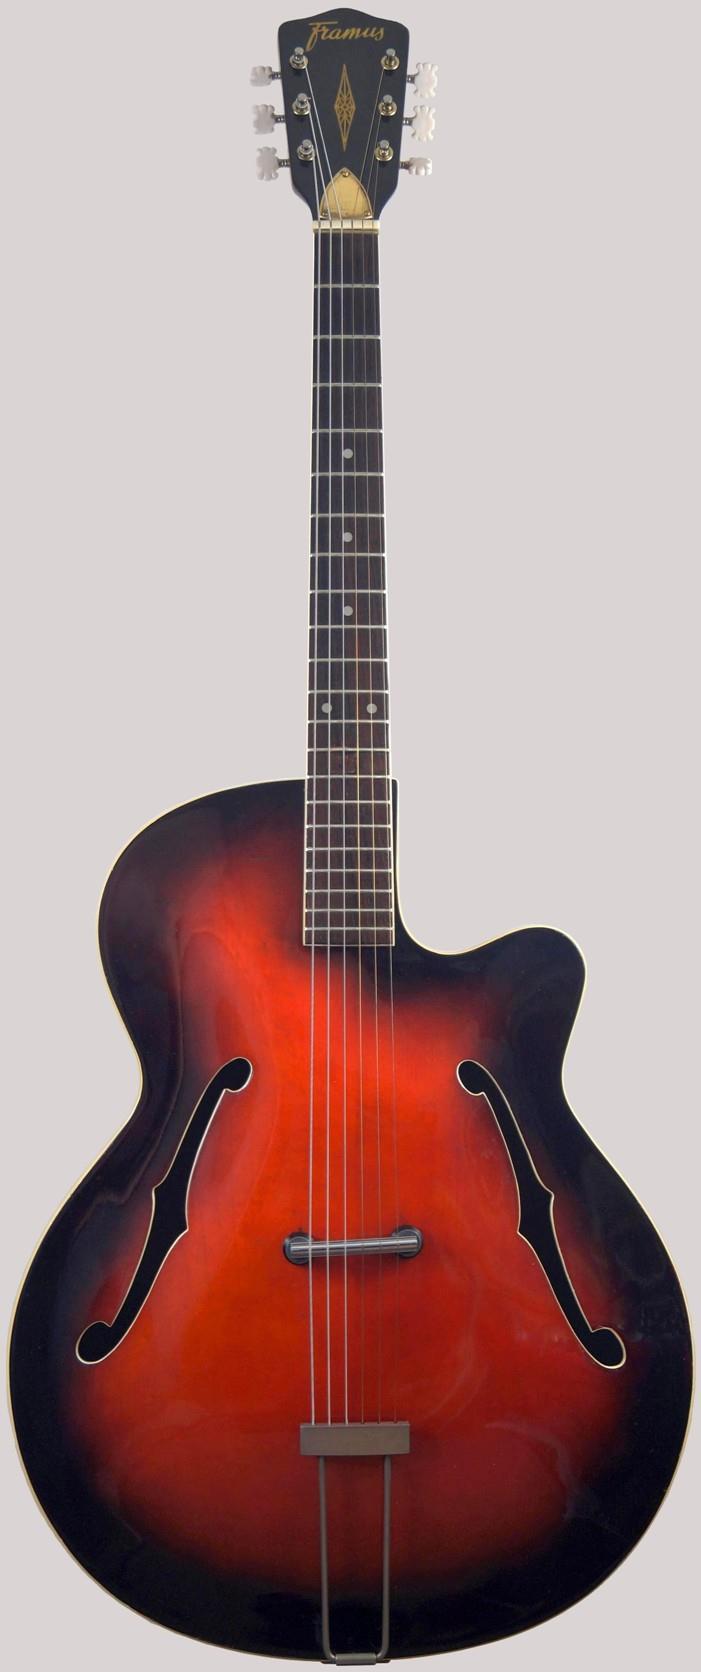 Framus 5 54 Riviera german Archtop Guitar